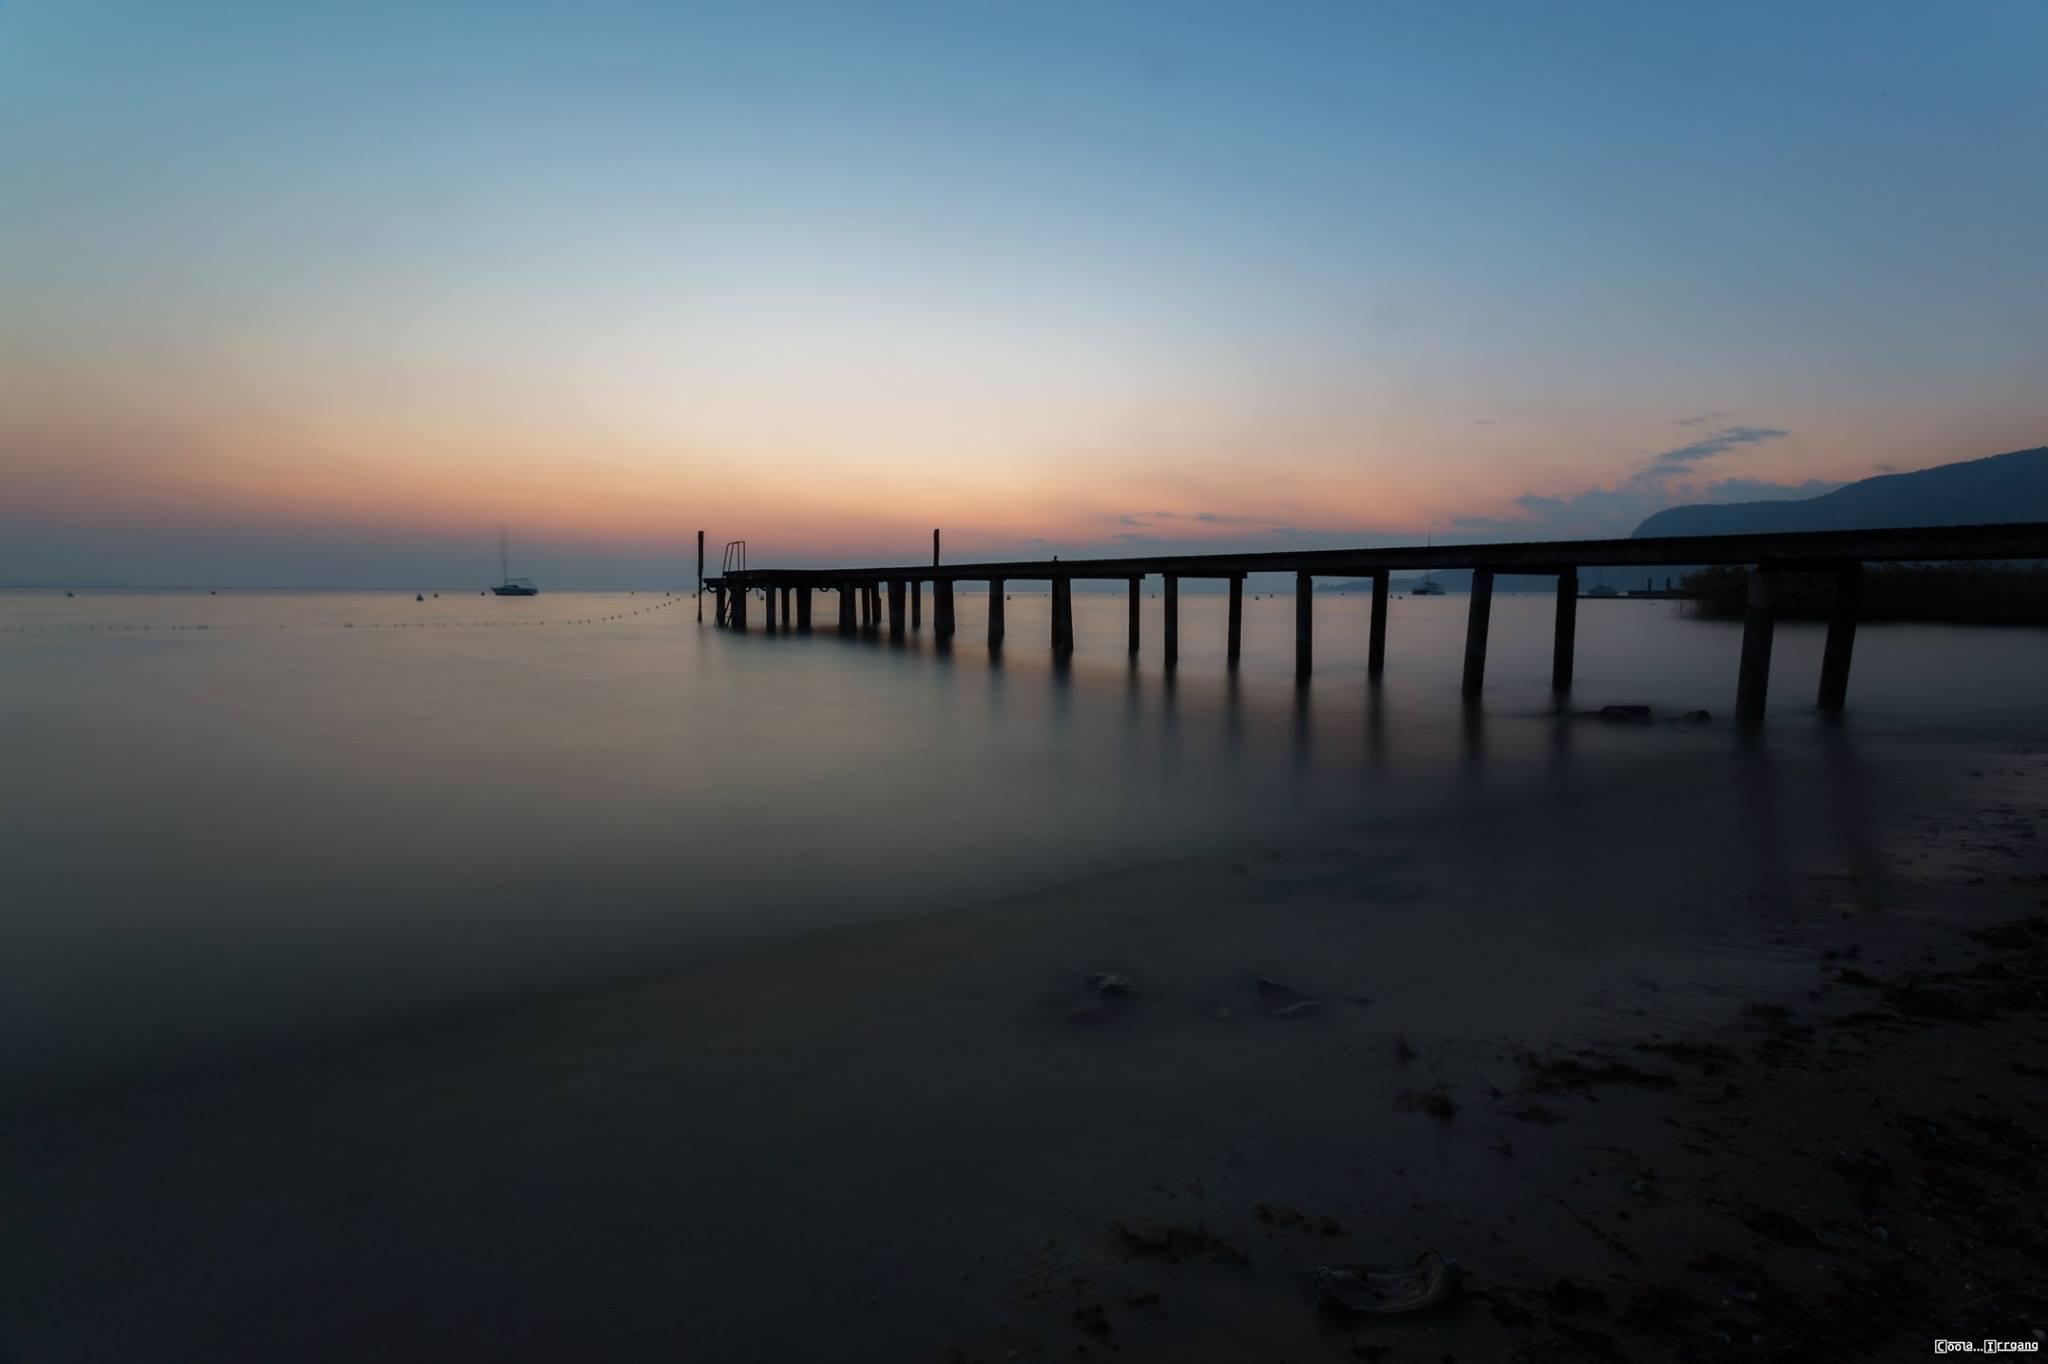 Sonnenuntergang in Bardolino am Gardasee